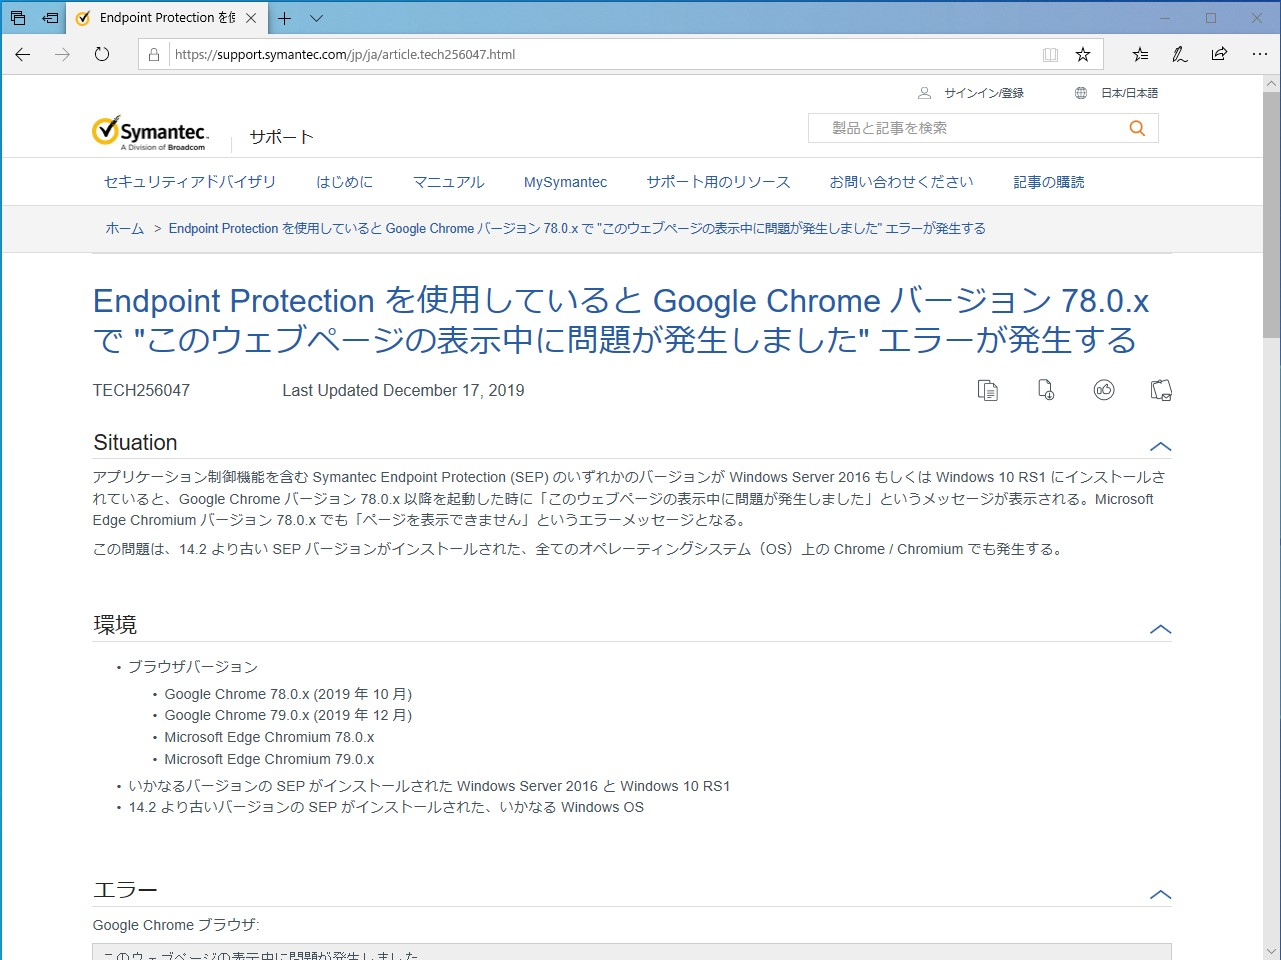 Symantec社のサポート文書